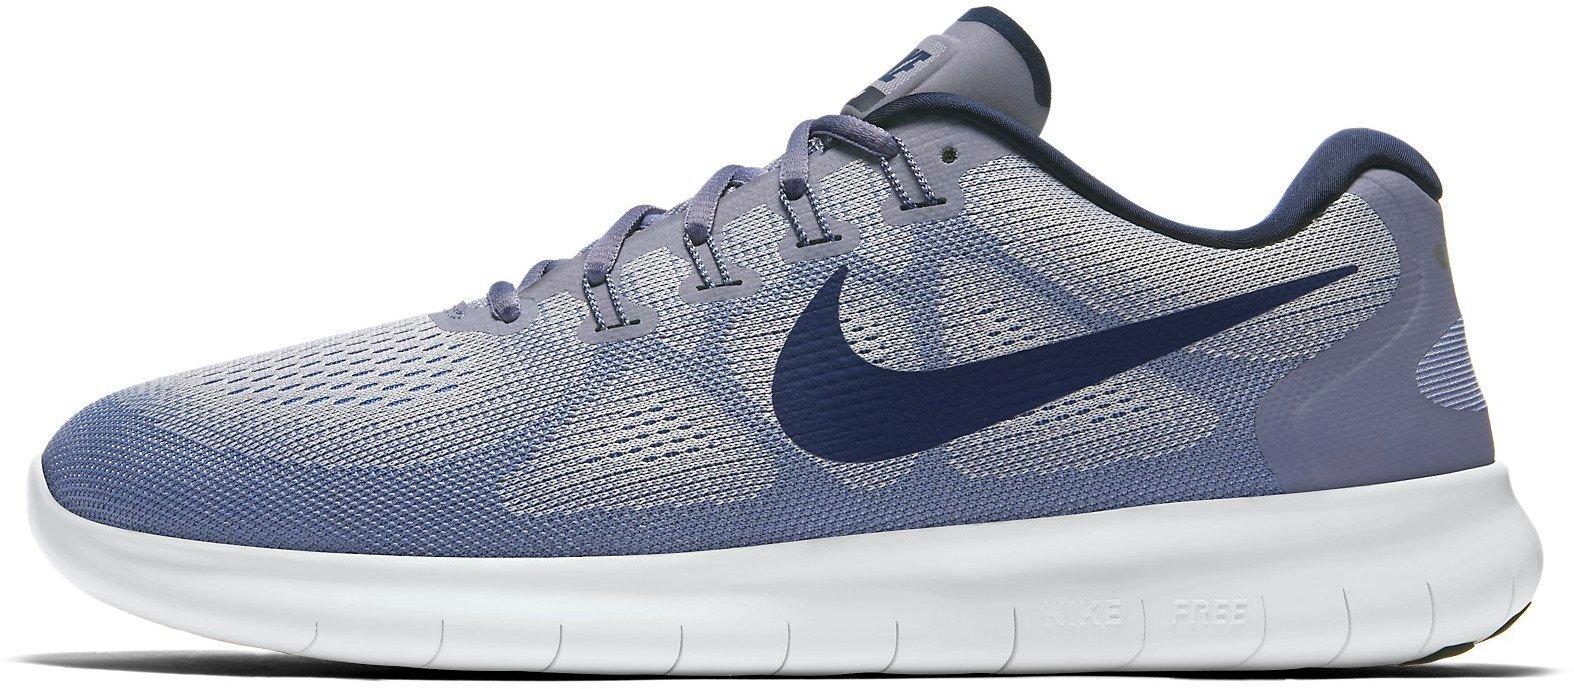 ded681cf5dbe7 Bežecké topánky Nike FREE RN 2017